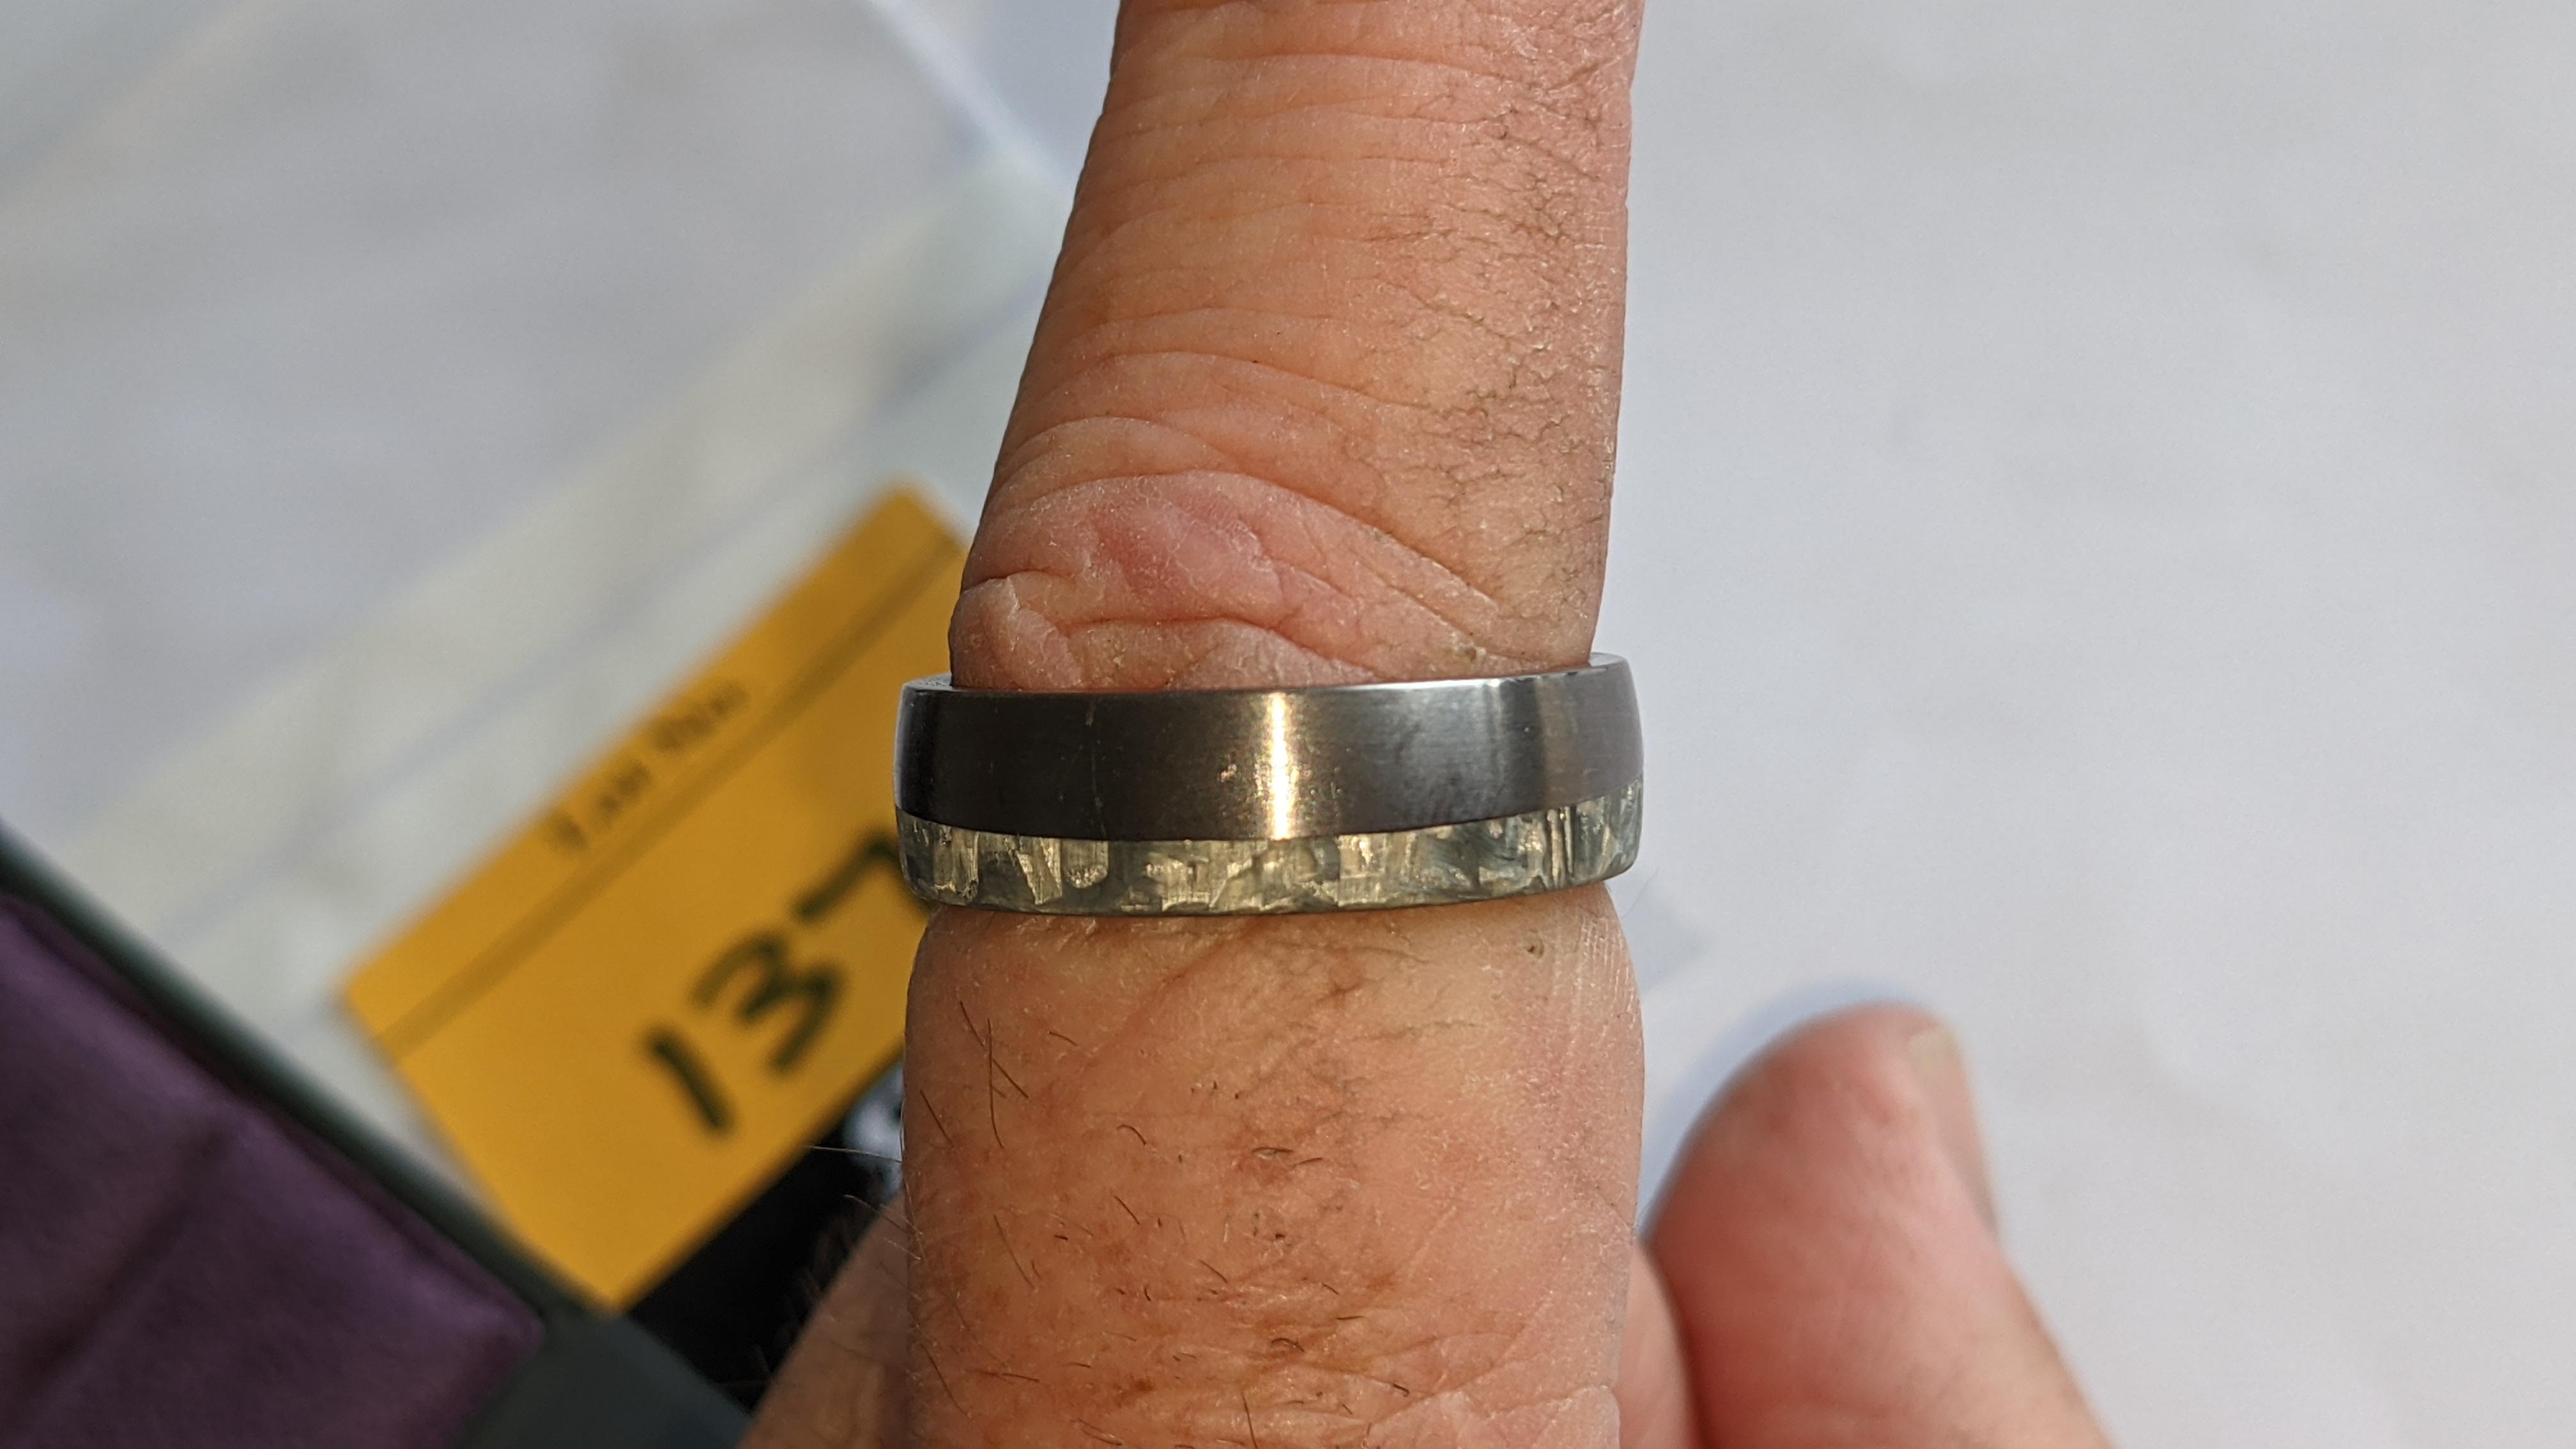 Tantalum & carbon ring RRP £600 - Image 10 of 13